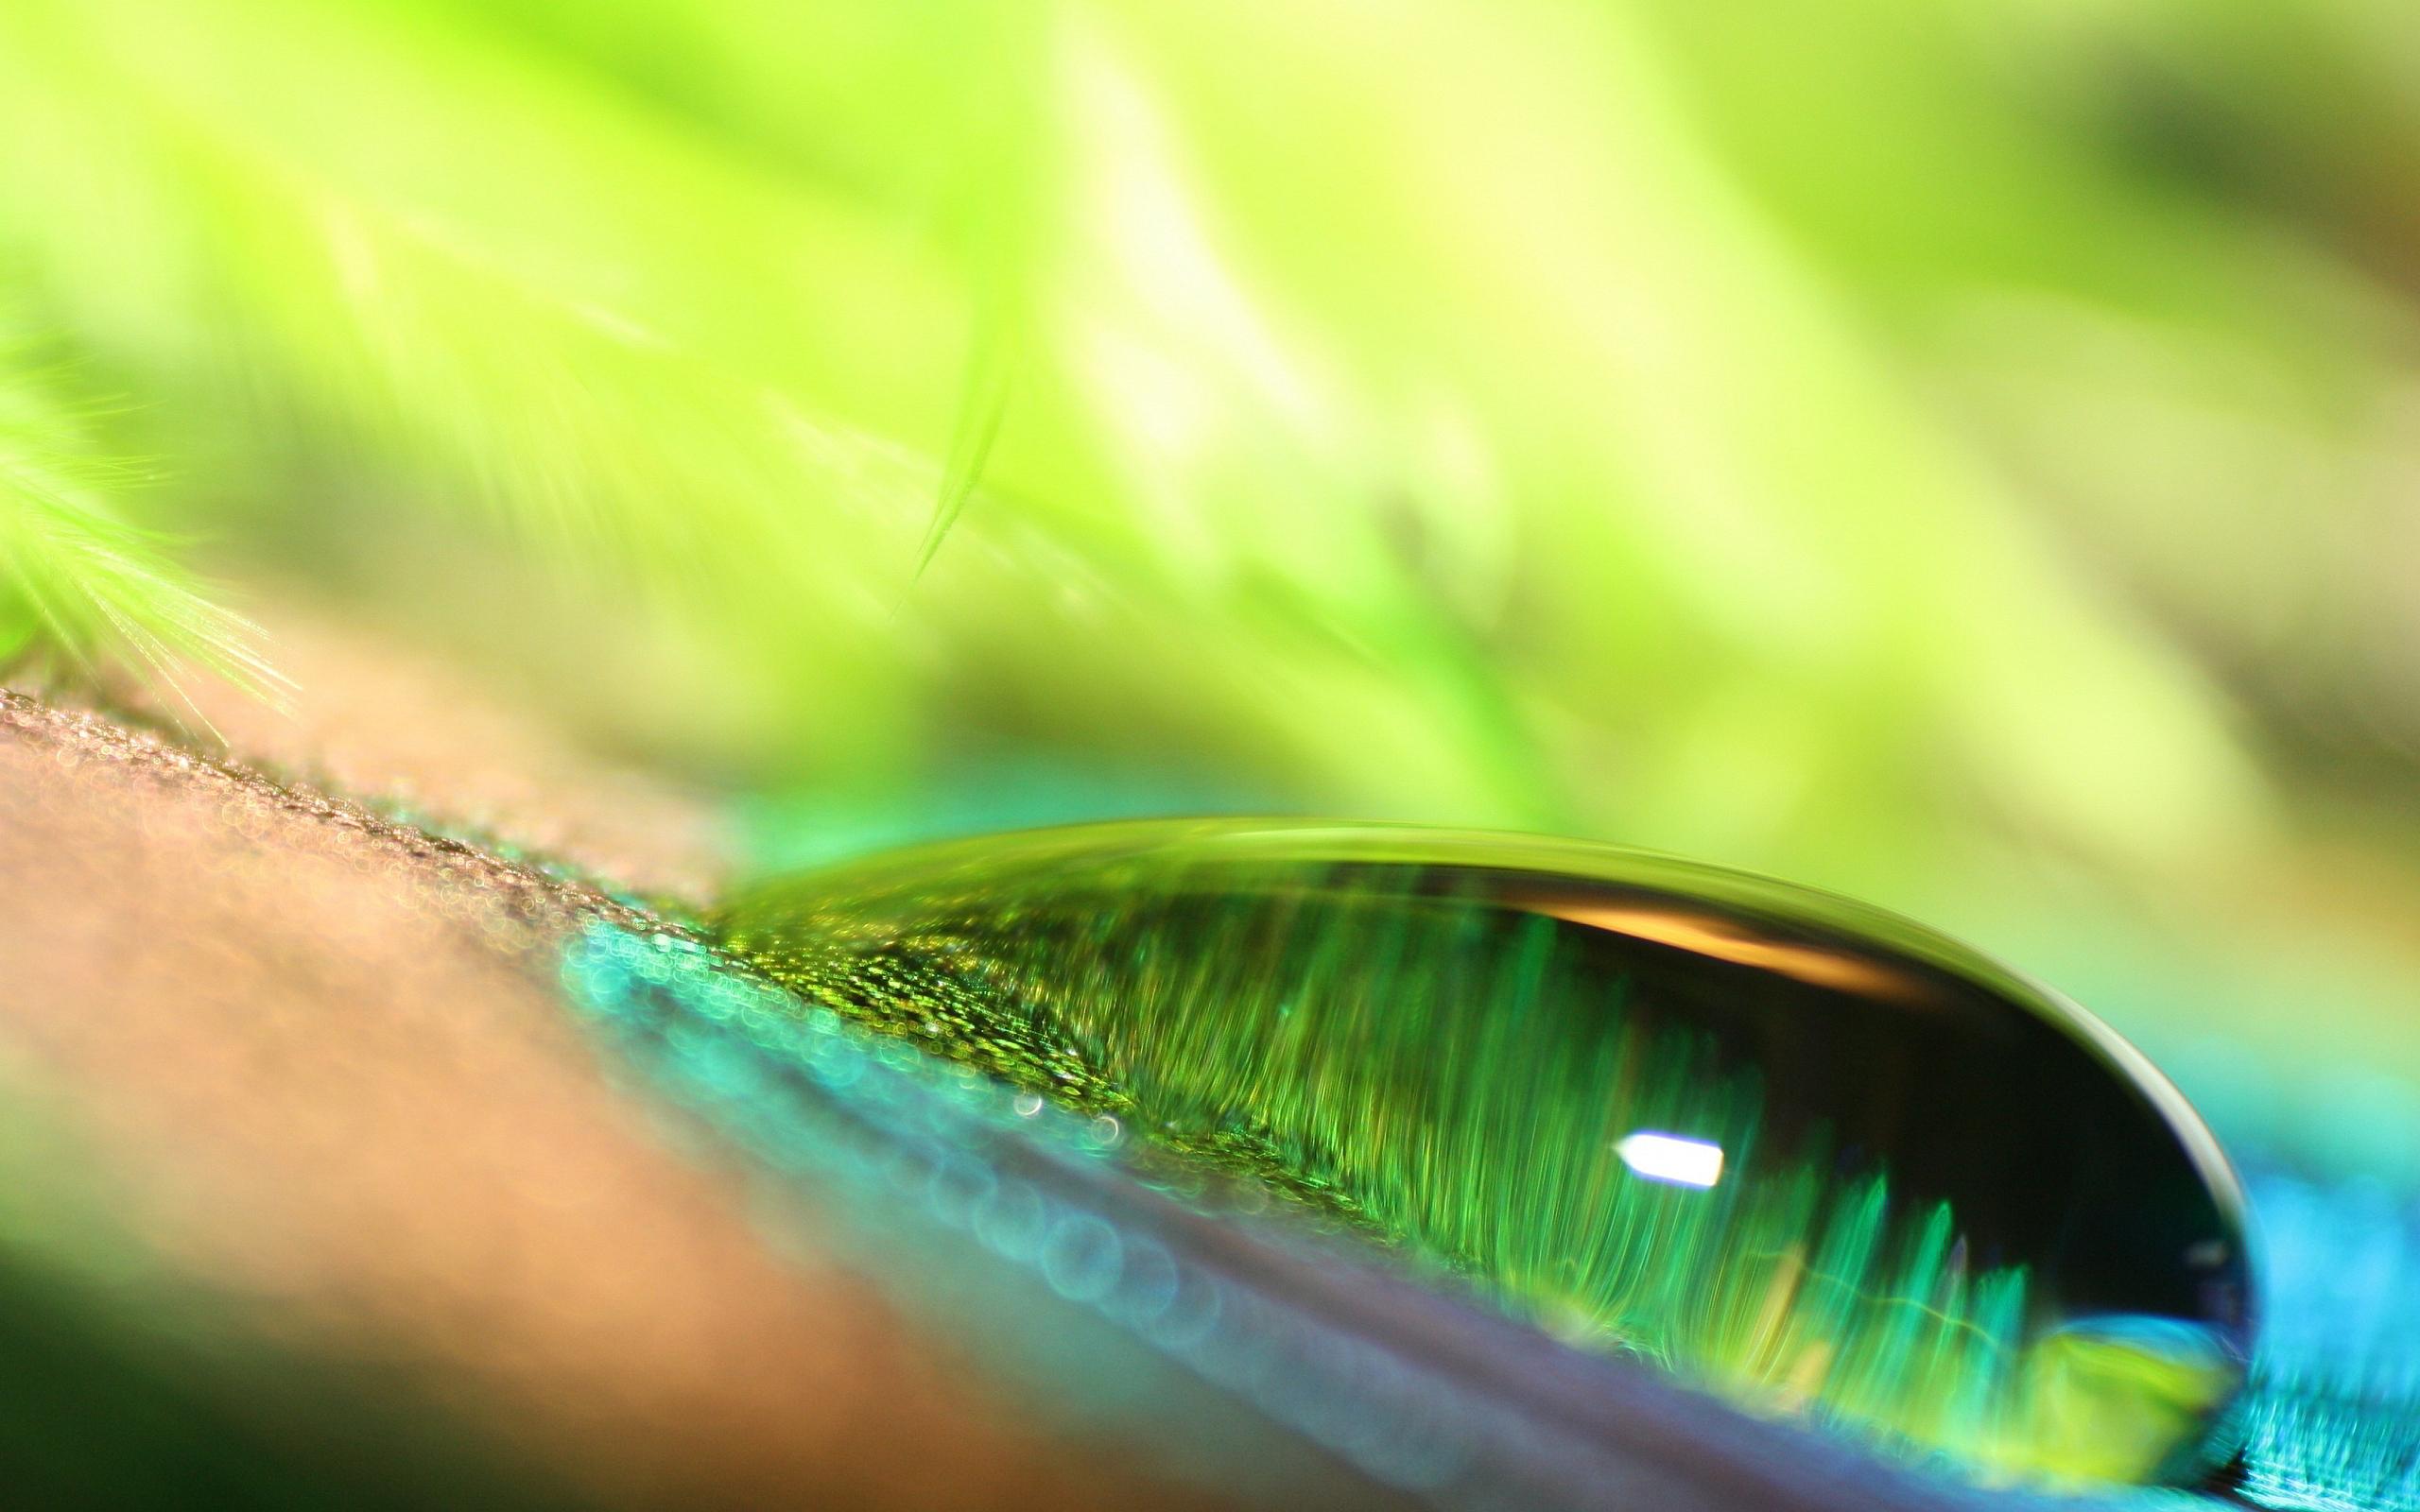 green water dew drop - HD Desktop Wallpapers | 4k HD